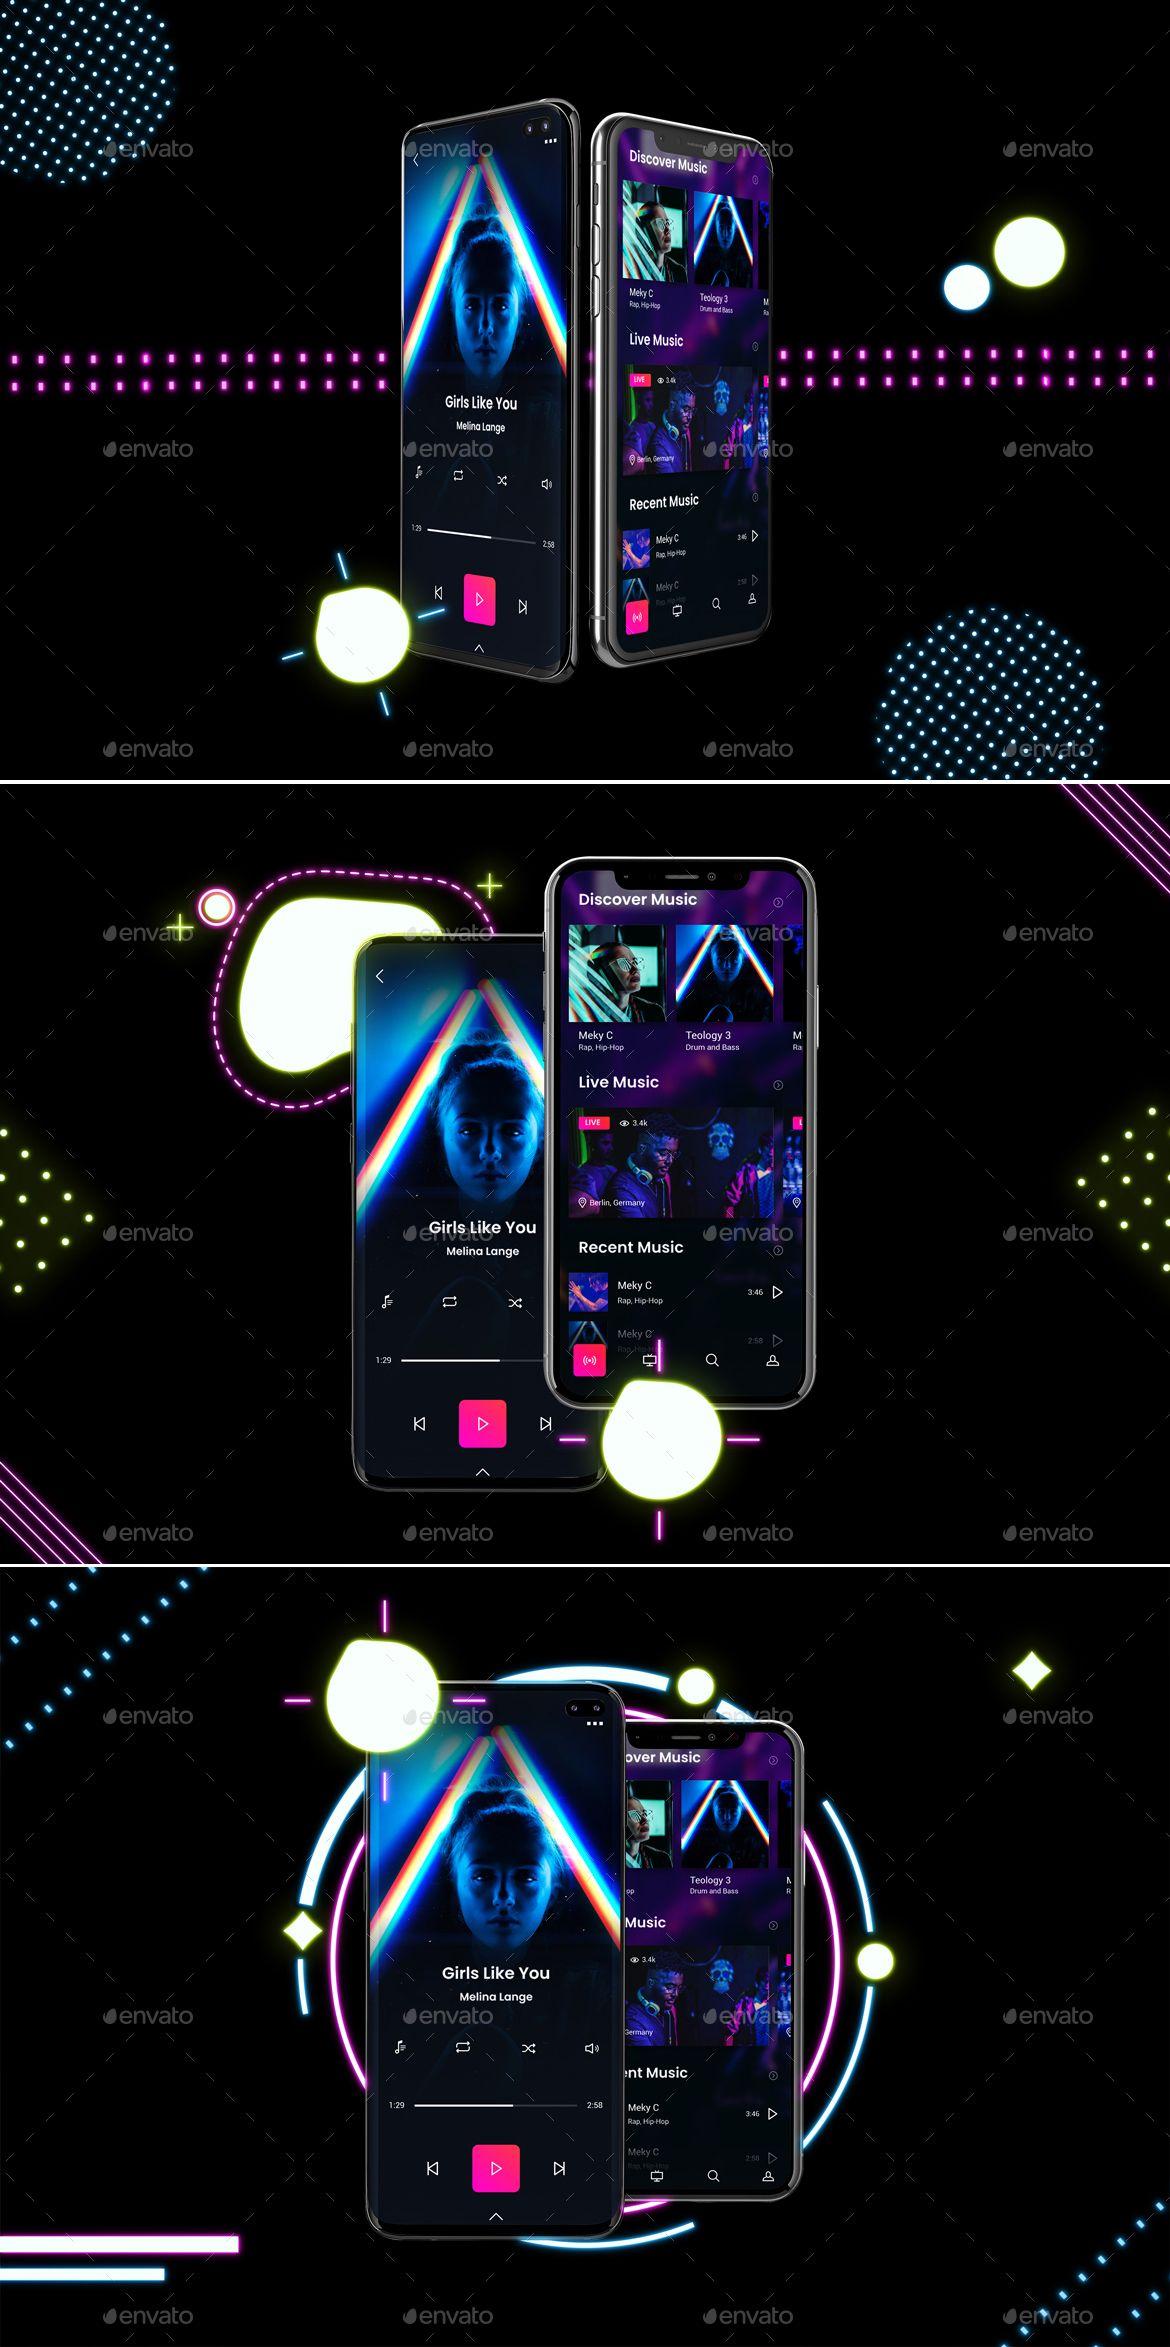 Neon IOS & Android Mockup Android mockup, Mockup, Neon